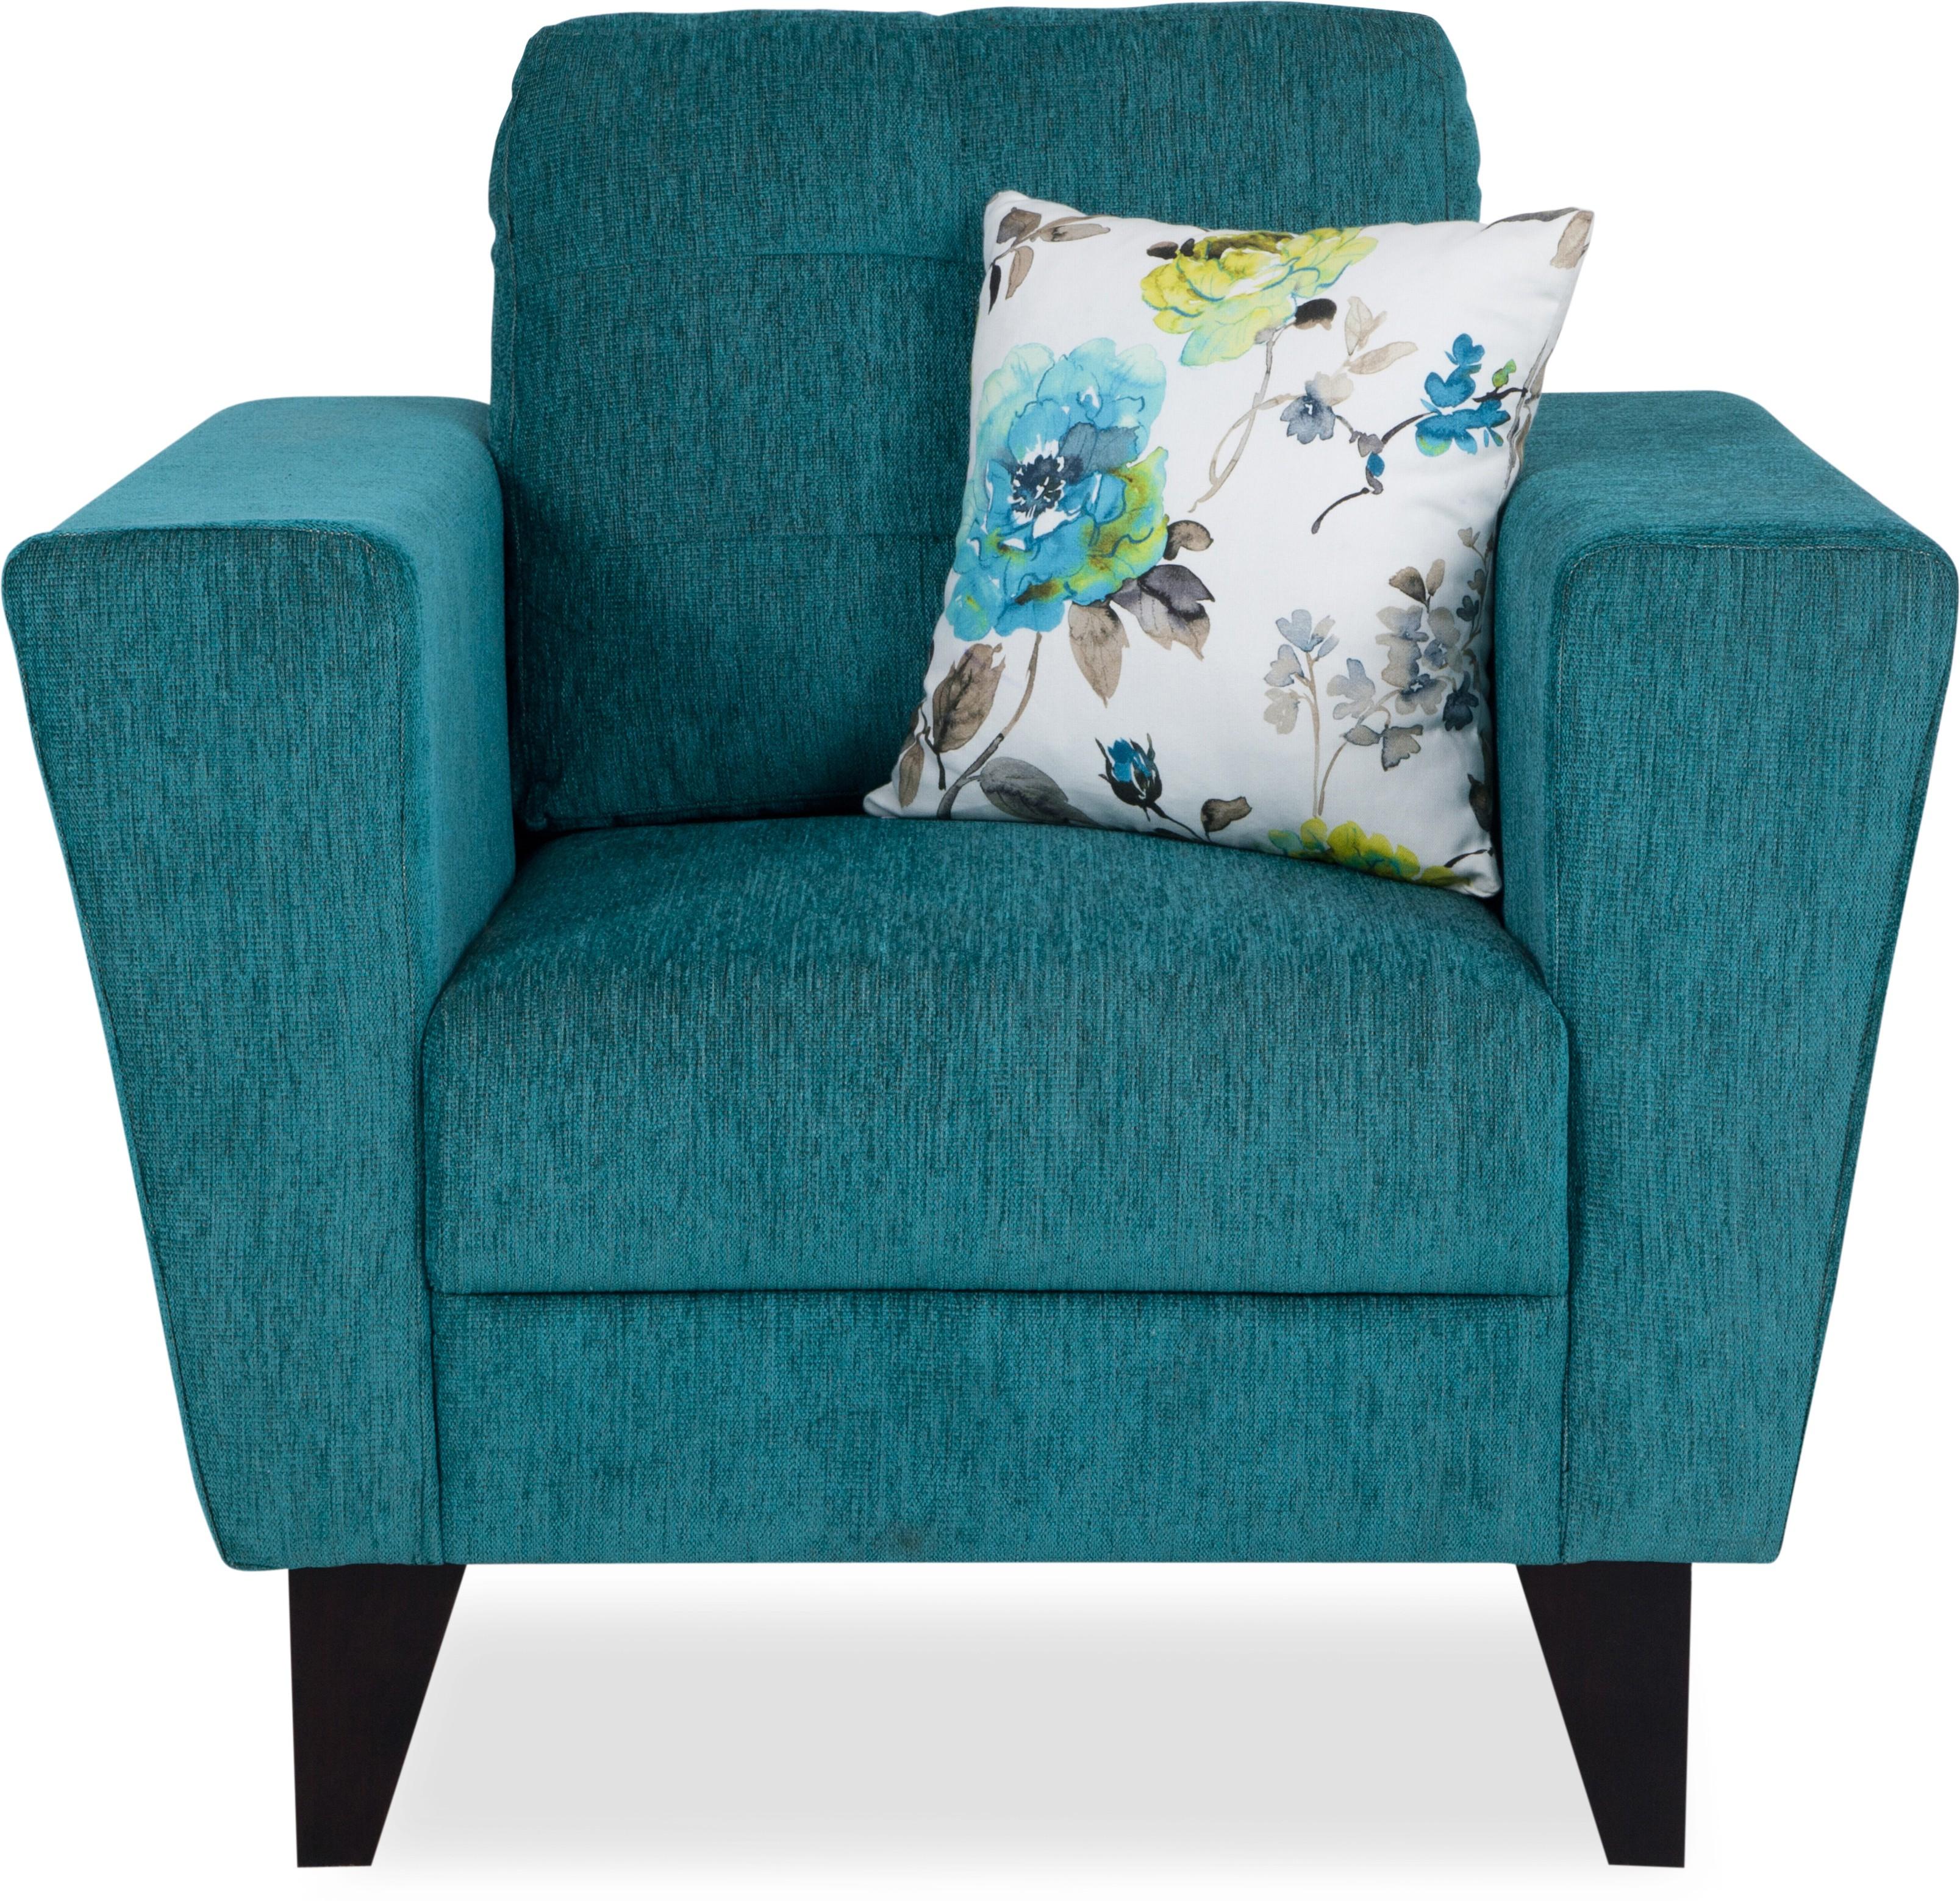 Urban Living Fabric 1 Seater Sofa